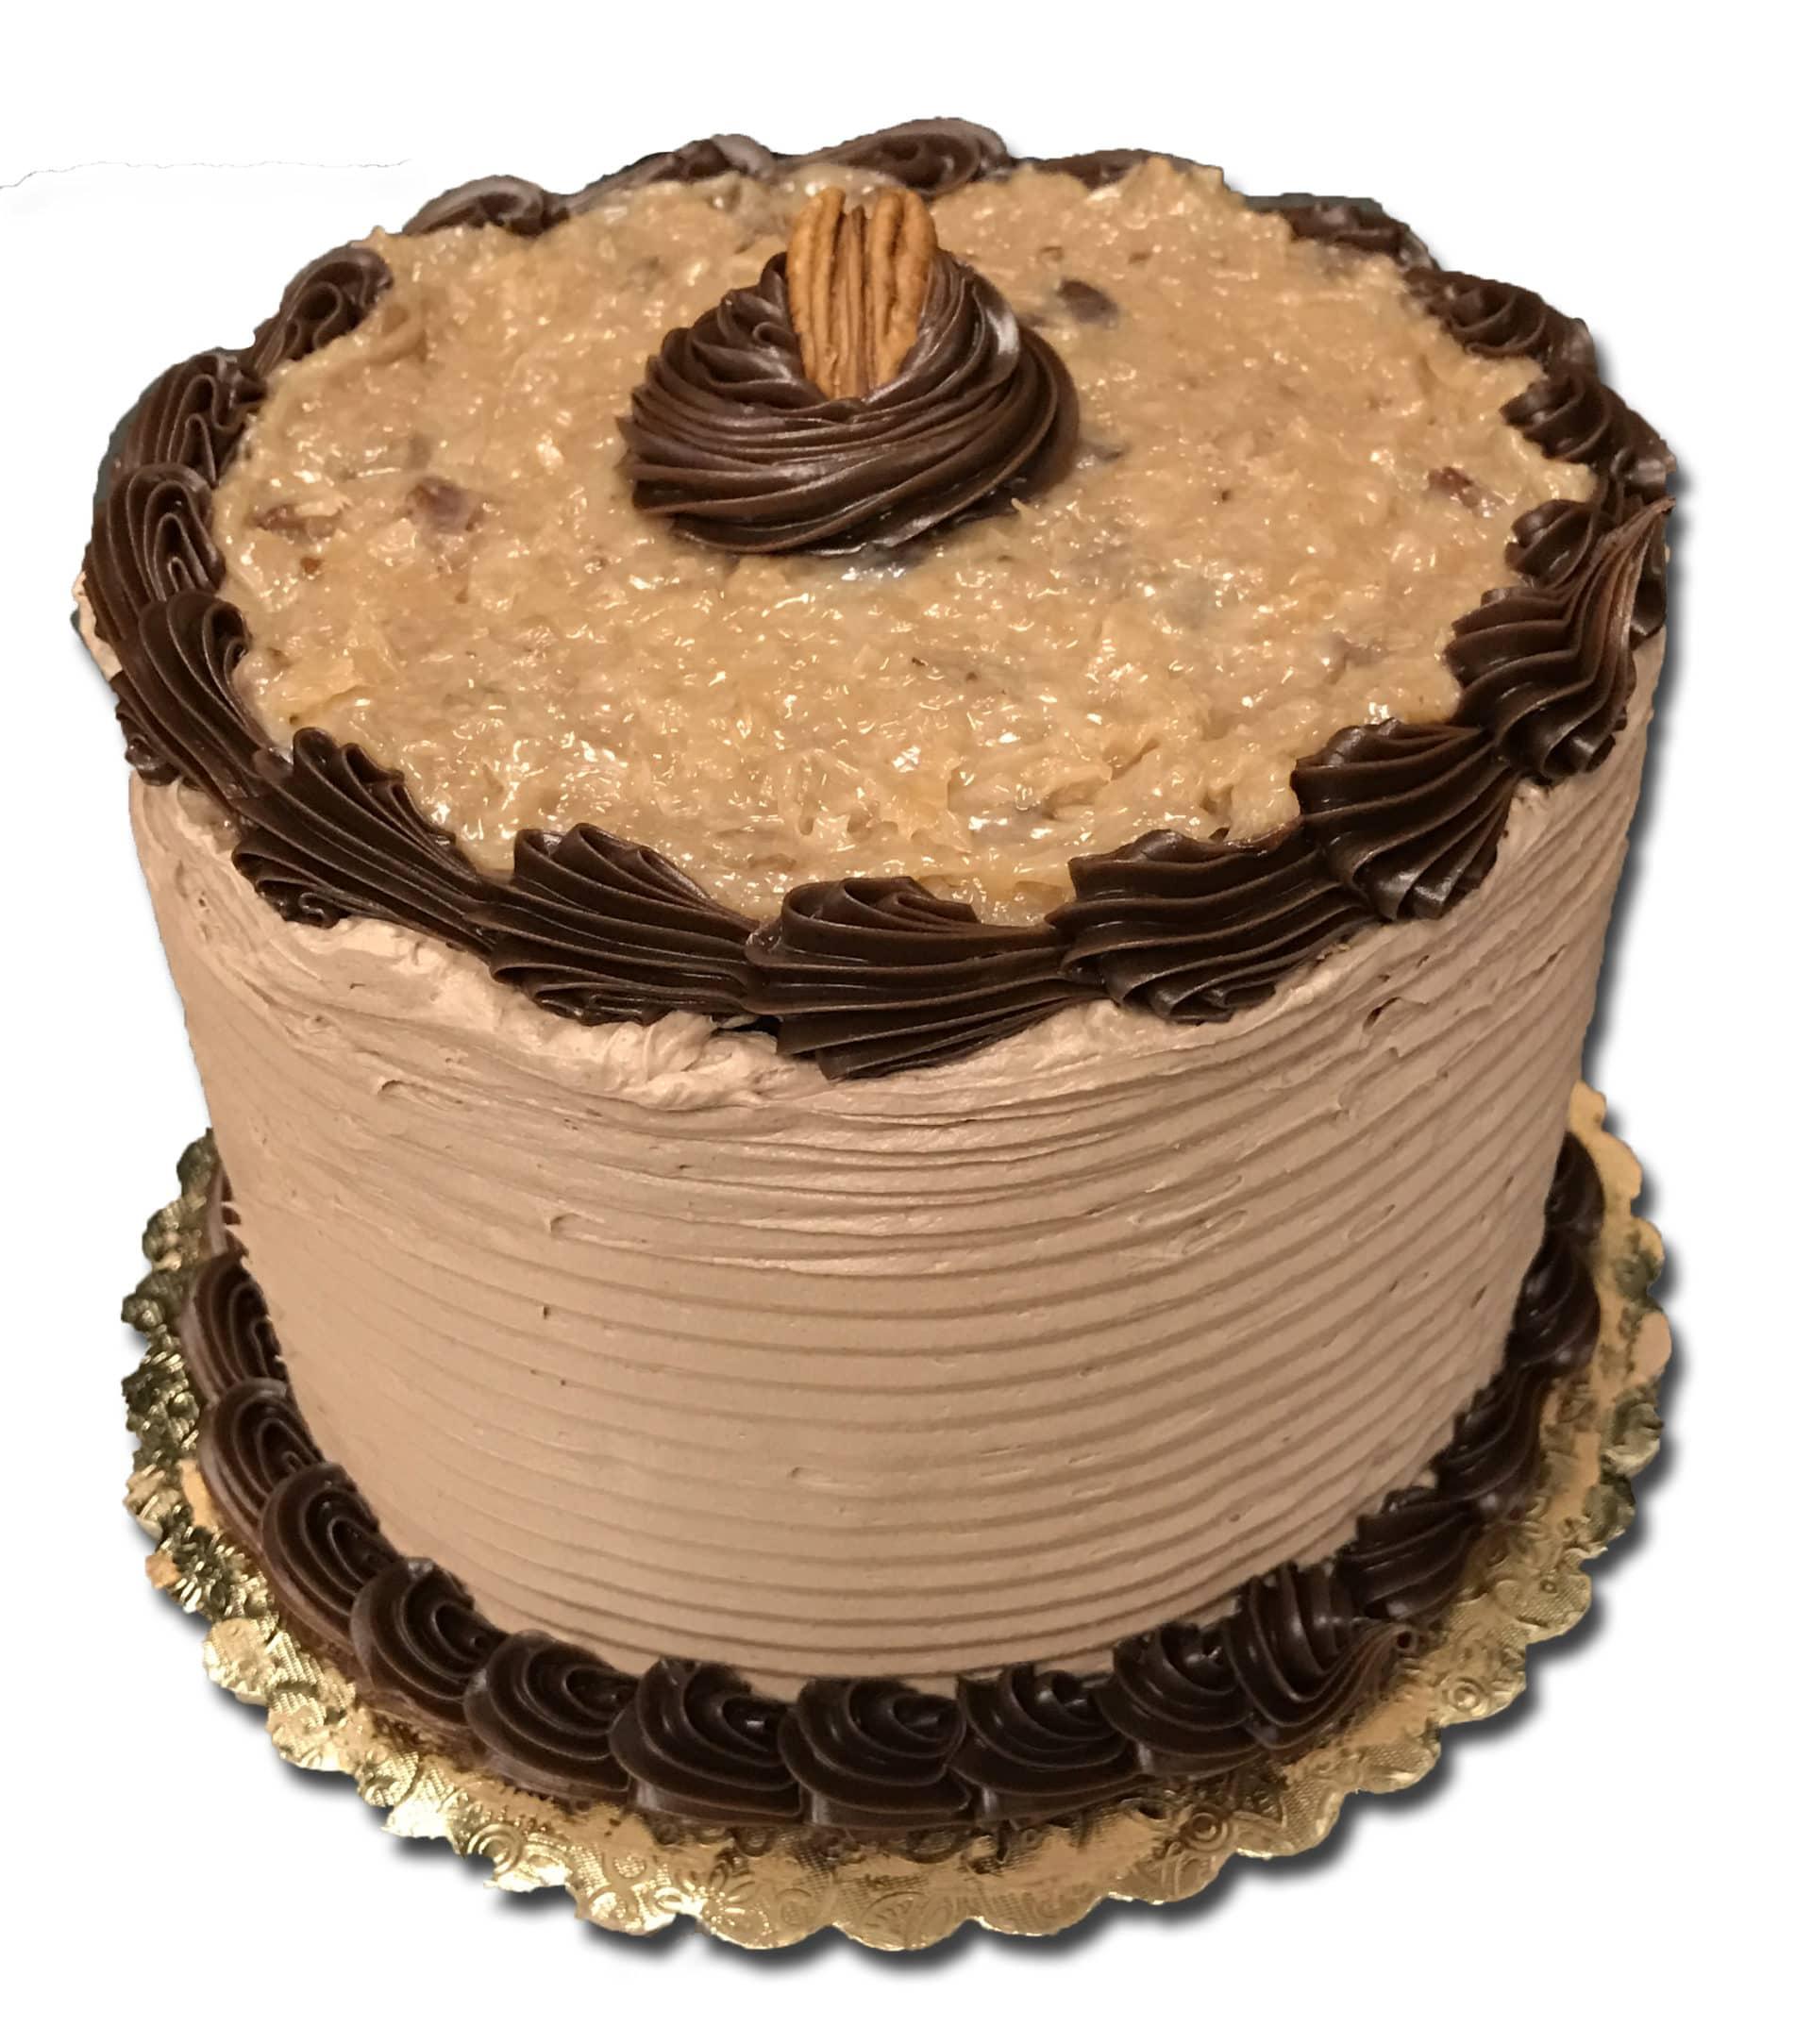 Terrific German Chocolate Dessert Cake 6 Aggies Bakery Cake Shop Funny Birthday Cards Online Aeocydamsfinfo